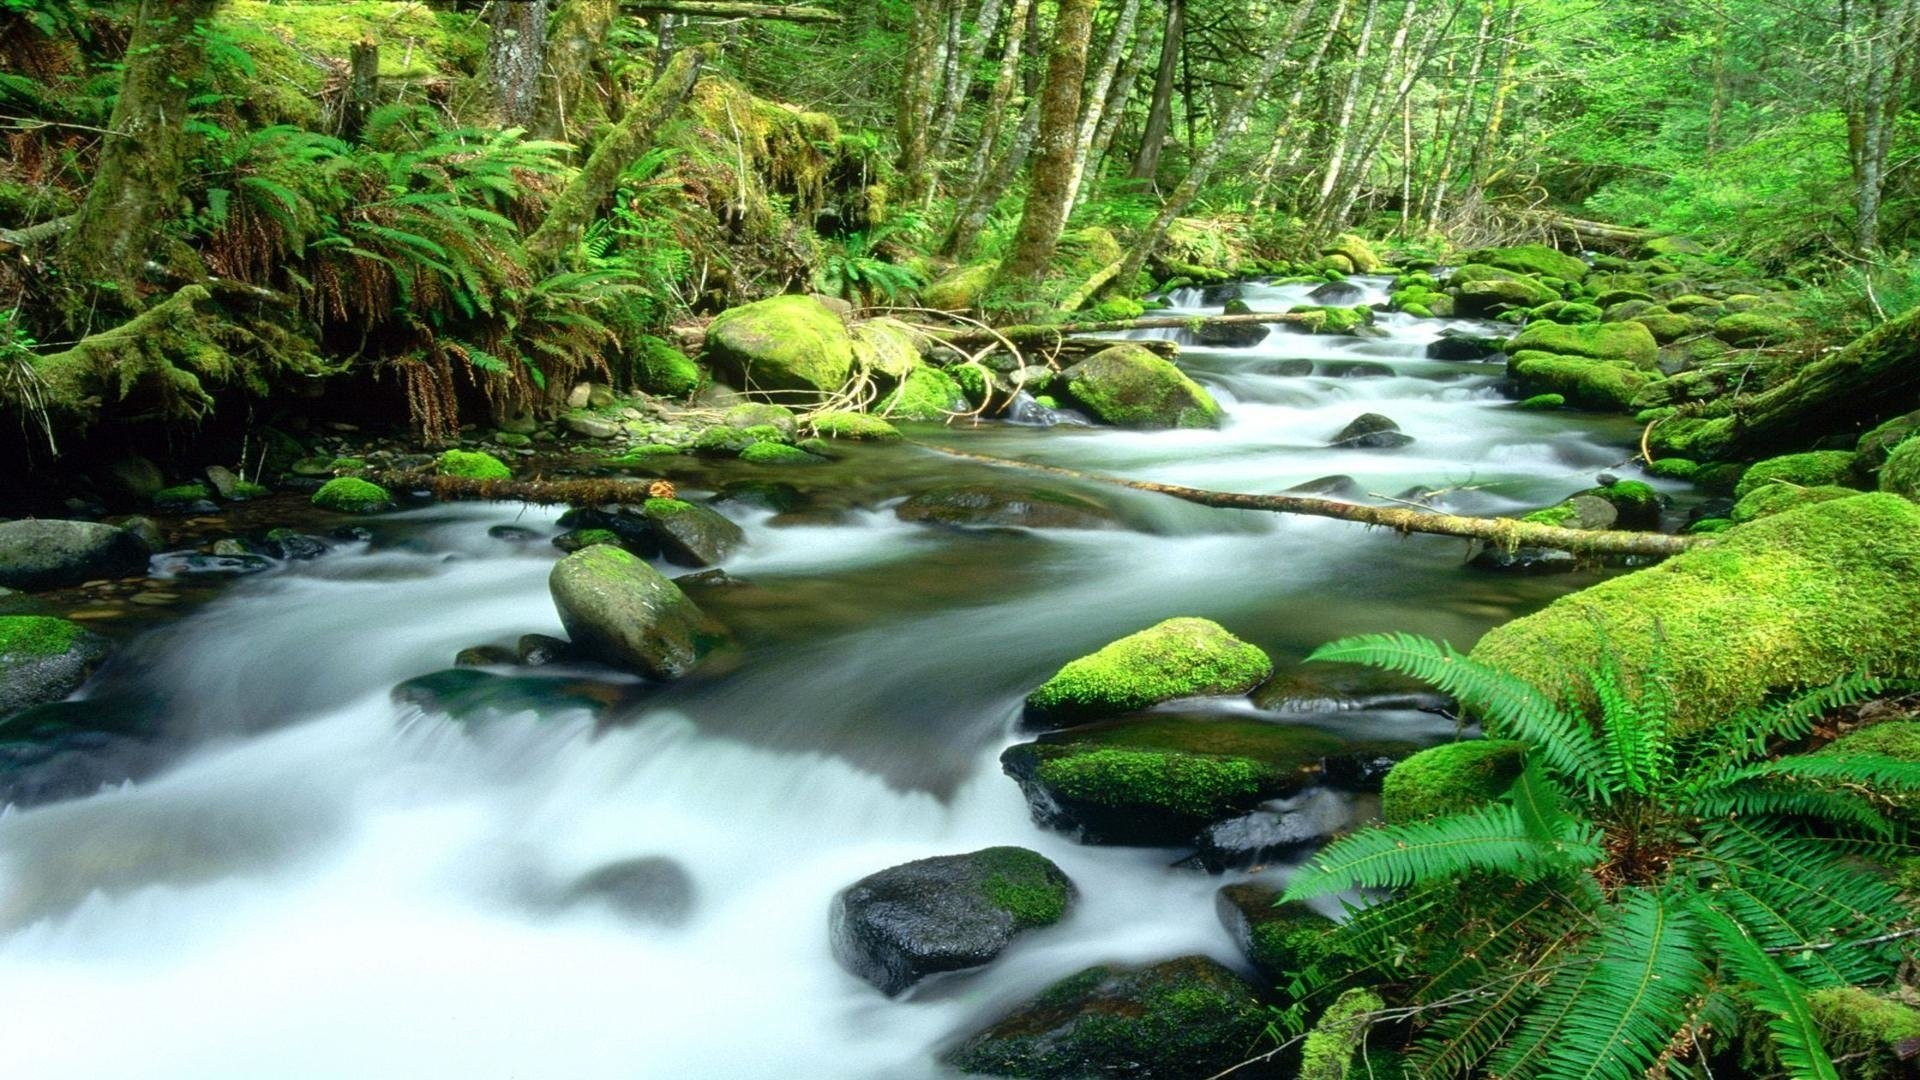 Daintree Rainforest HD Wallpaper | Background Image ...